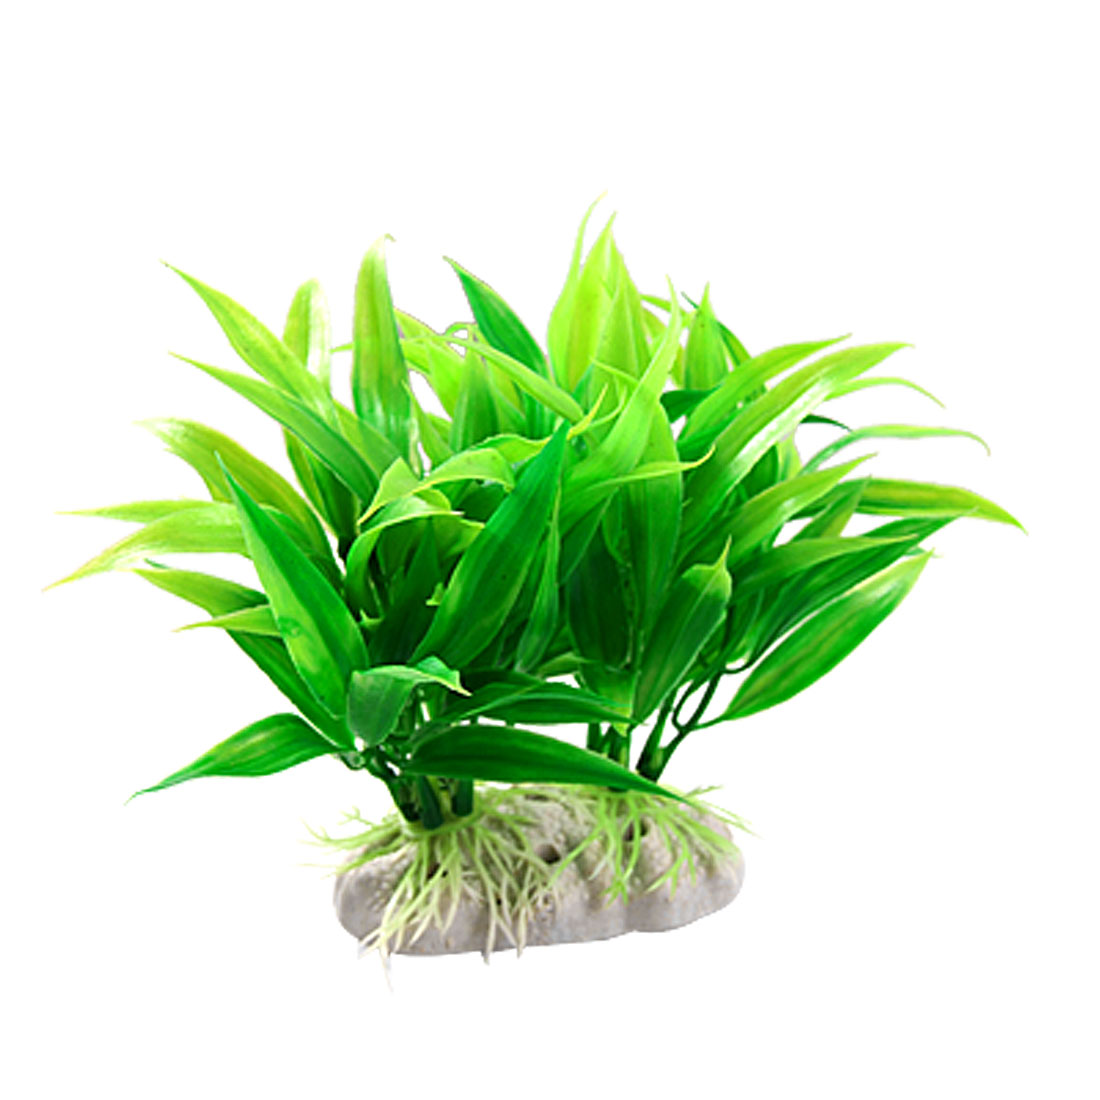 White Ceramic Base Long Leaf Green Plastic Plants Decoration for Aquarium